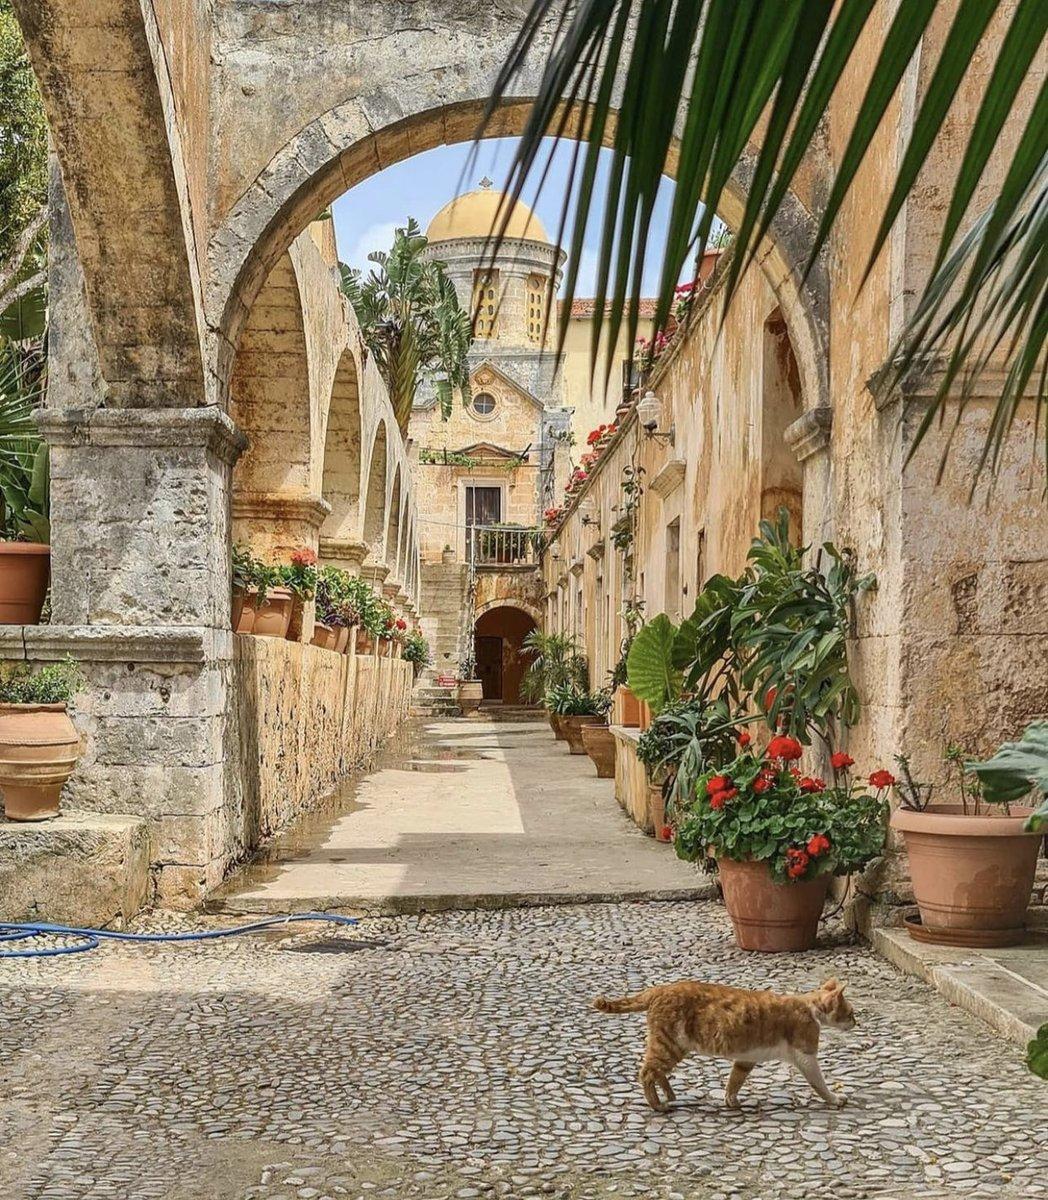 Chania, Crete, Greece 🇬🇷